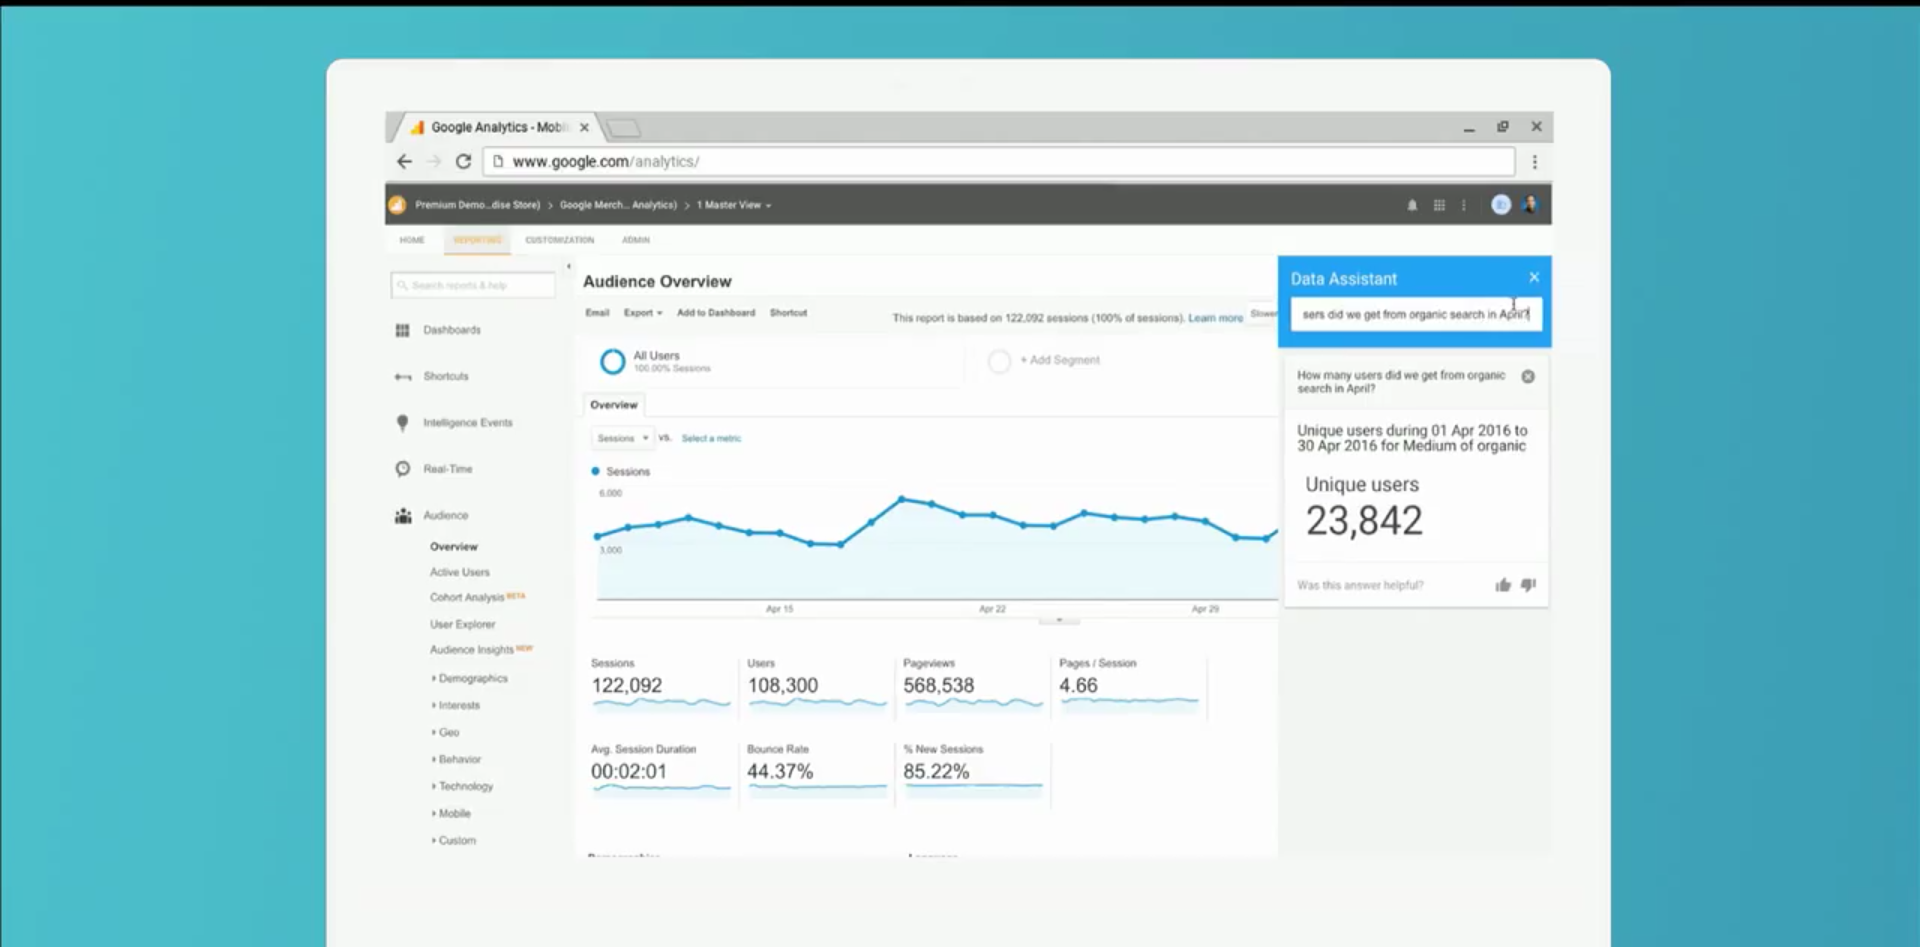 Google Data Assistant